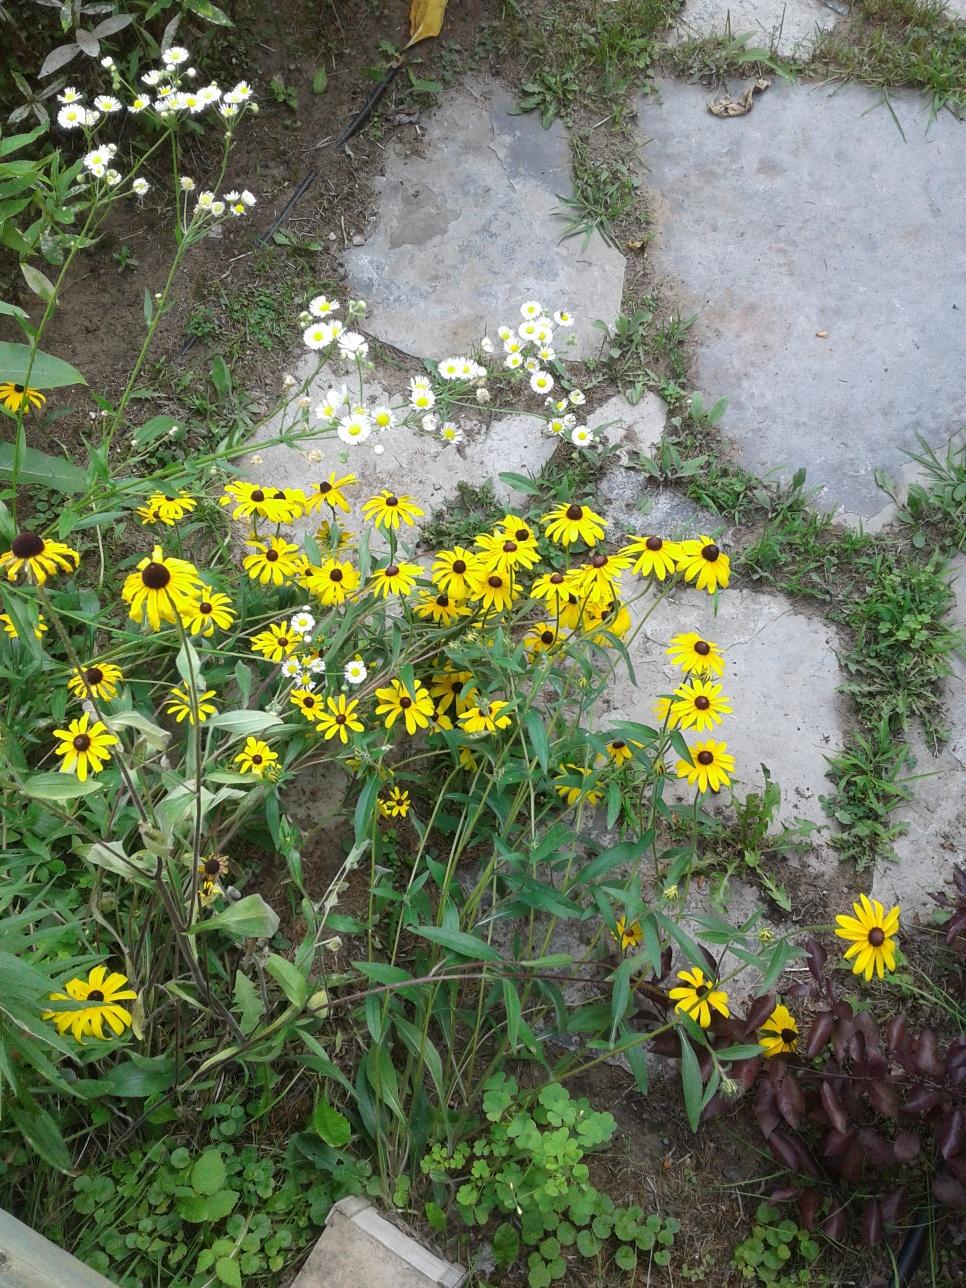 Black-eyed Susans and daisies 2019